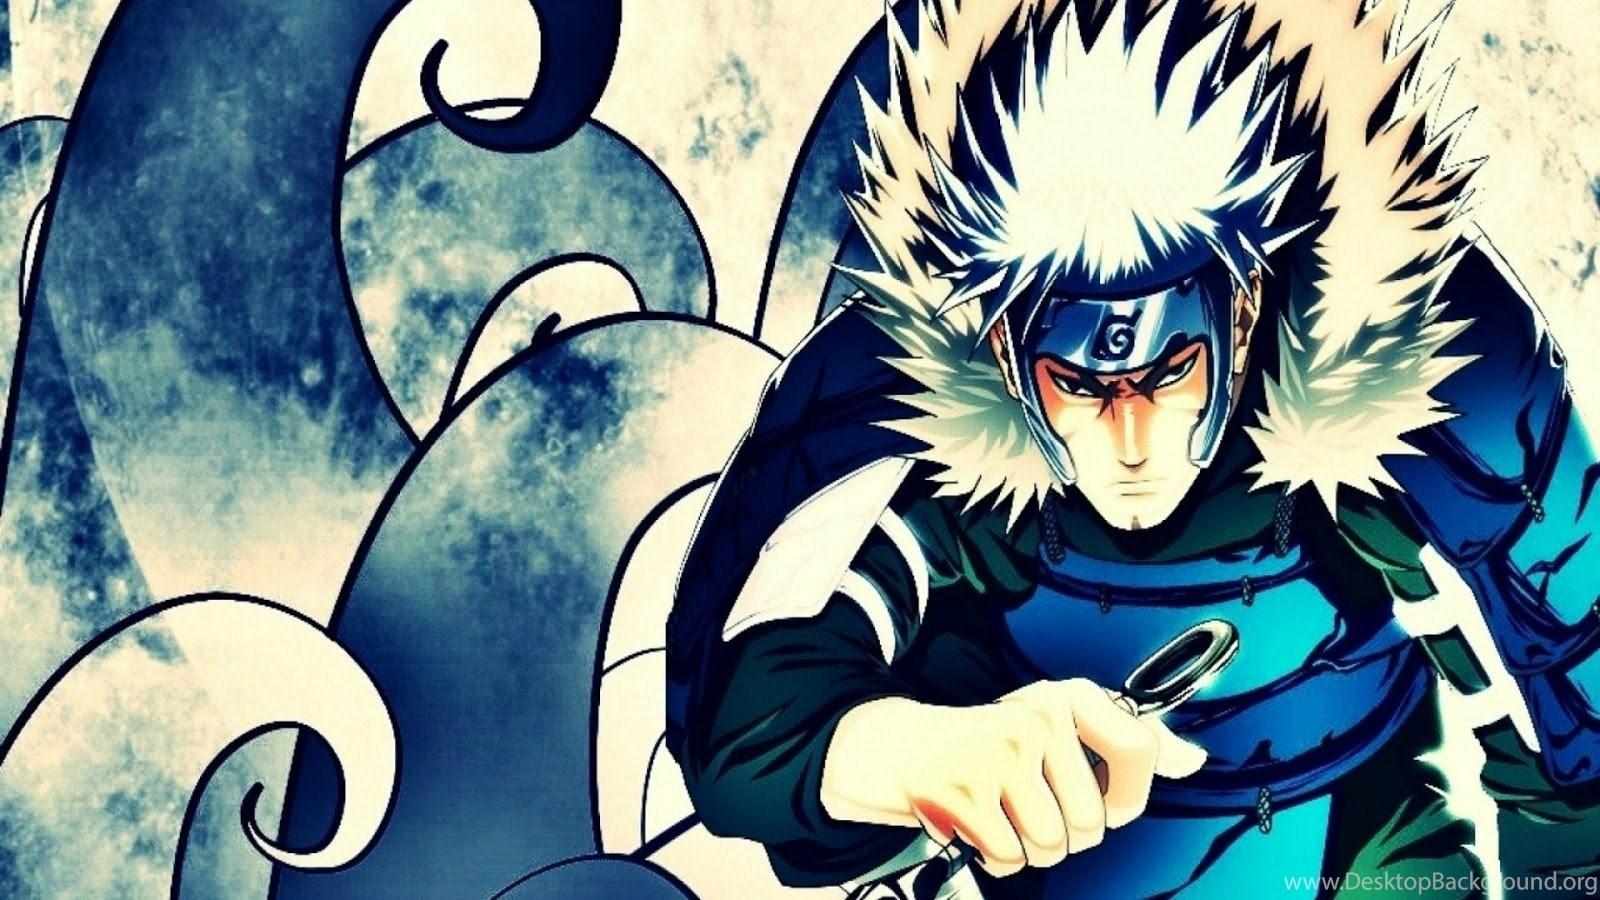 4800 Gambar Naruto Keren Wallpaper Terbaru